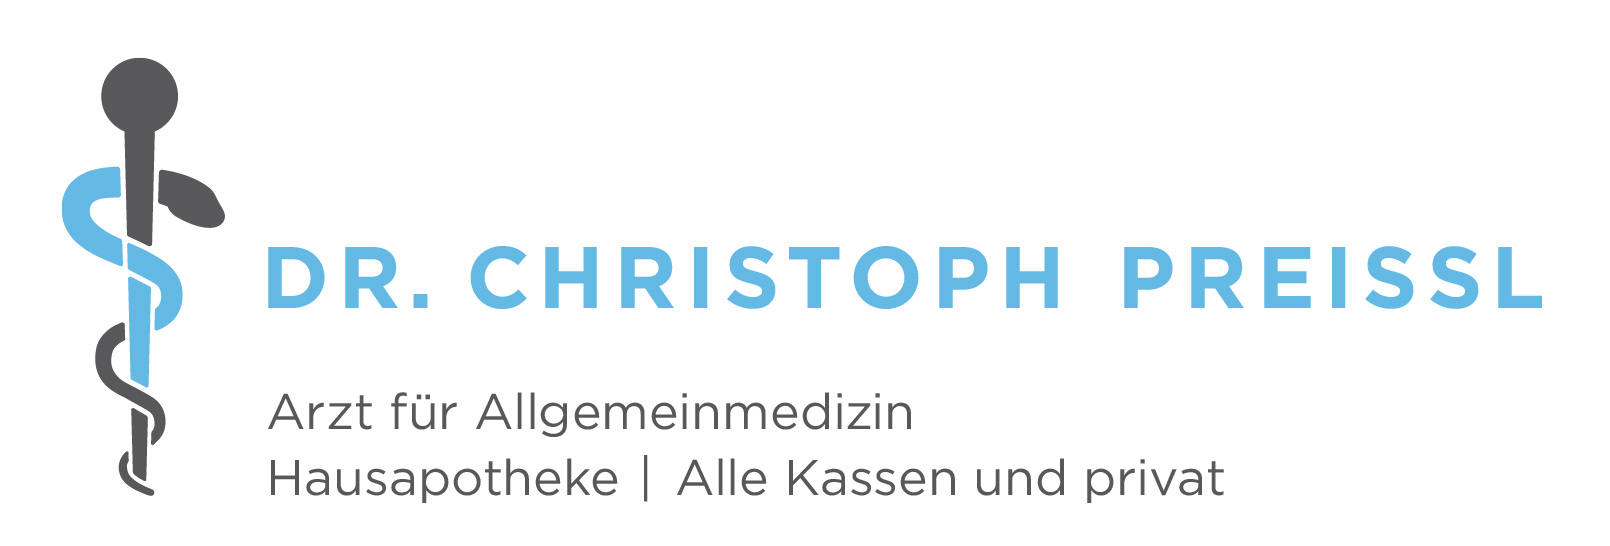 Dr. Christoph Preissl